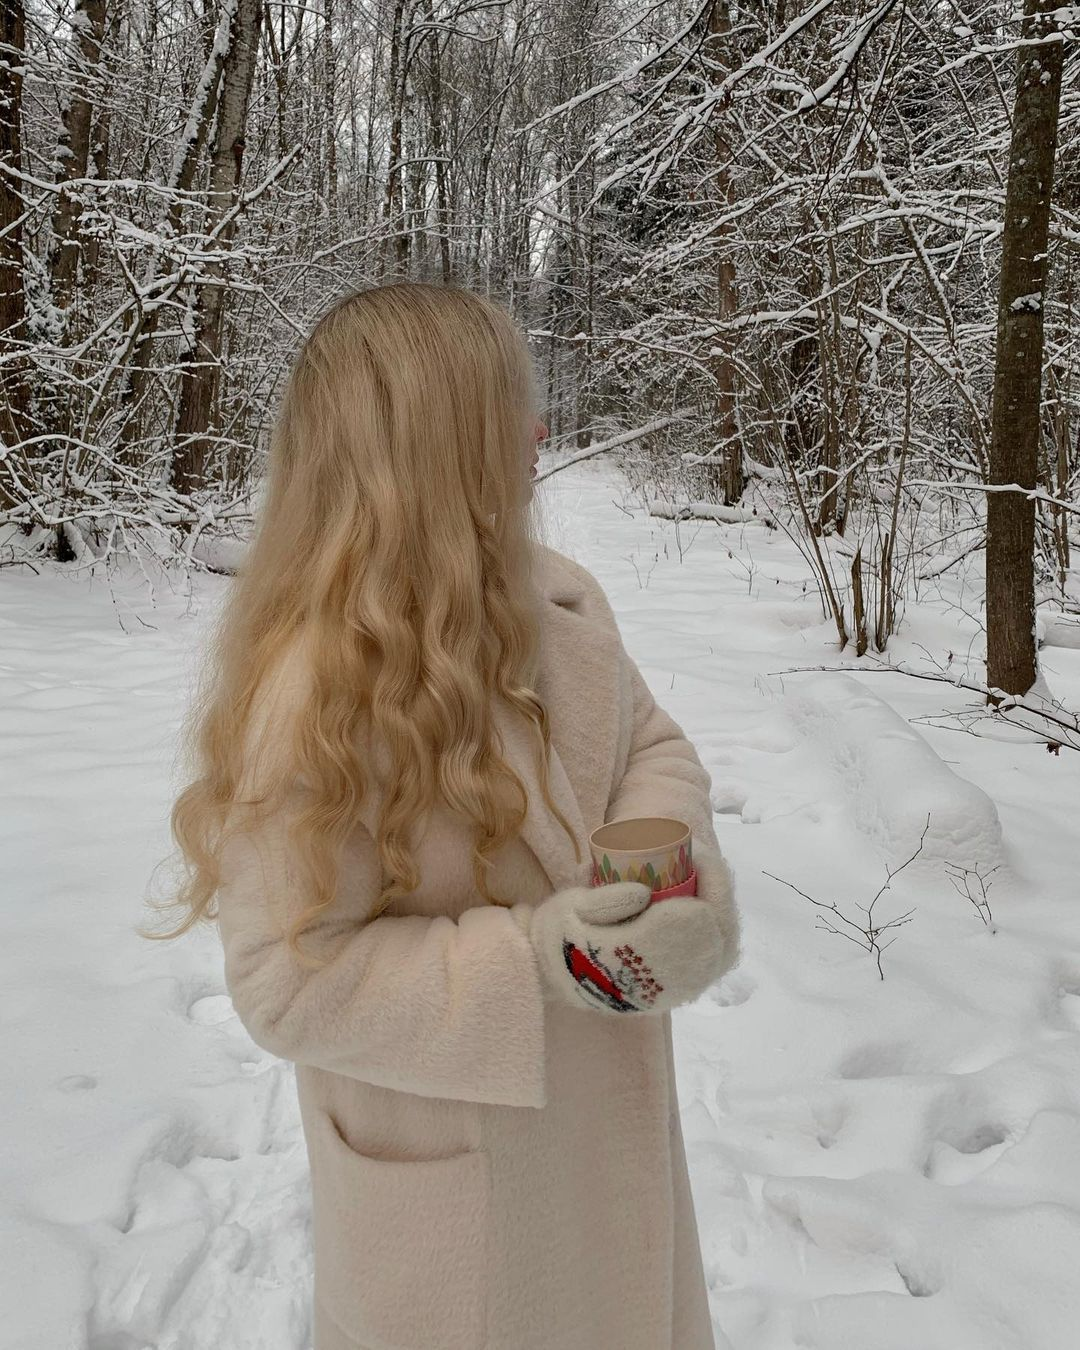 Alyona Alyonaa Y Posted On Instagram Jan 10 2021 At 9 01am Utc In 2021 Winter Photos Winter Aesthetic Winter Princess